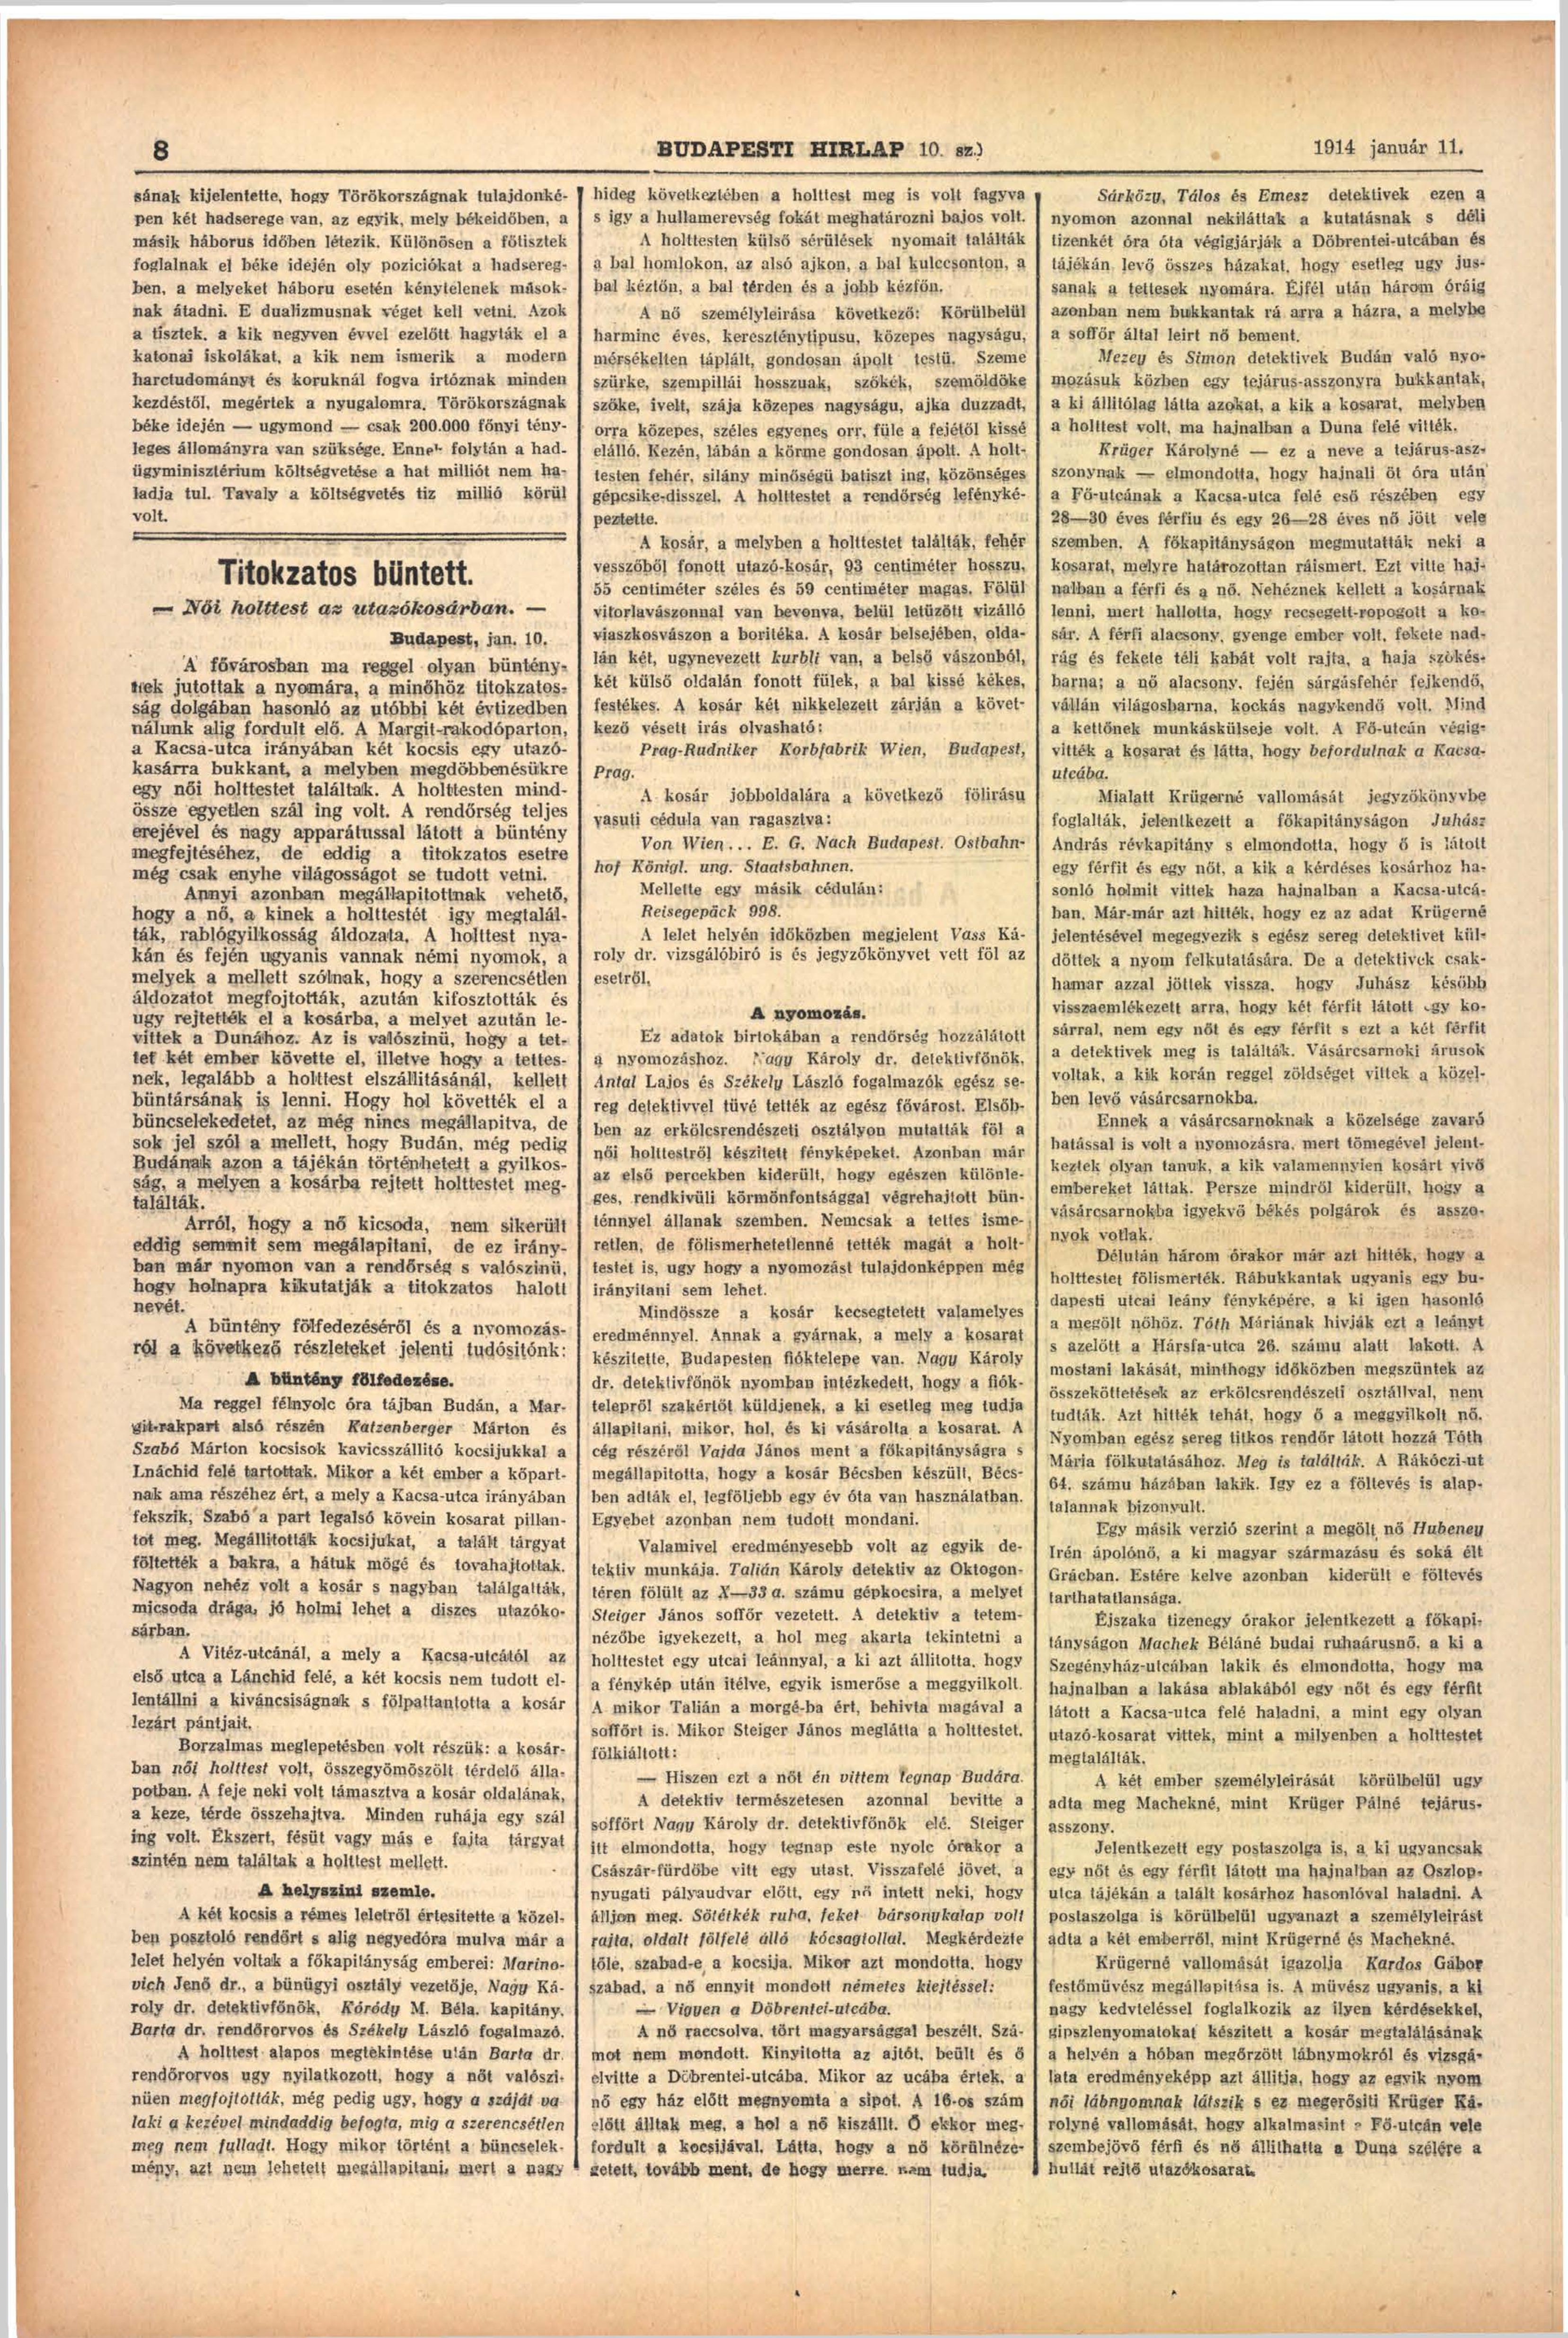 budapestihirlap_1914_01_pages285-285-page-0.jpg